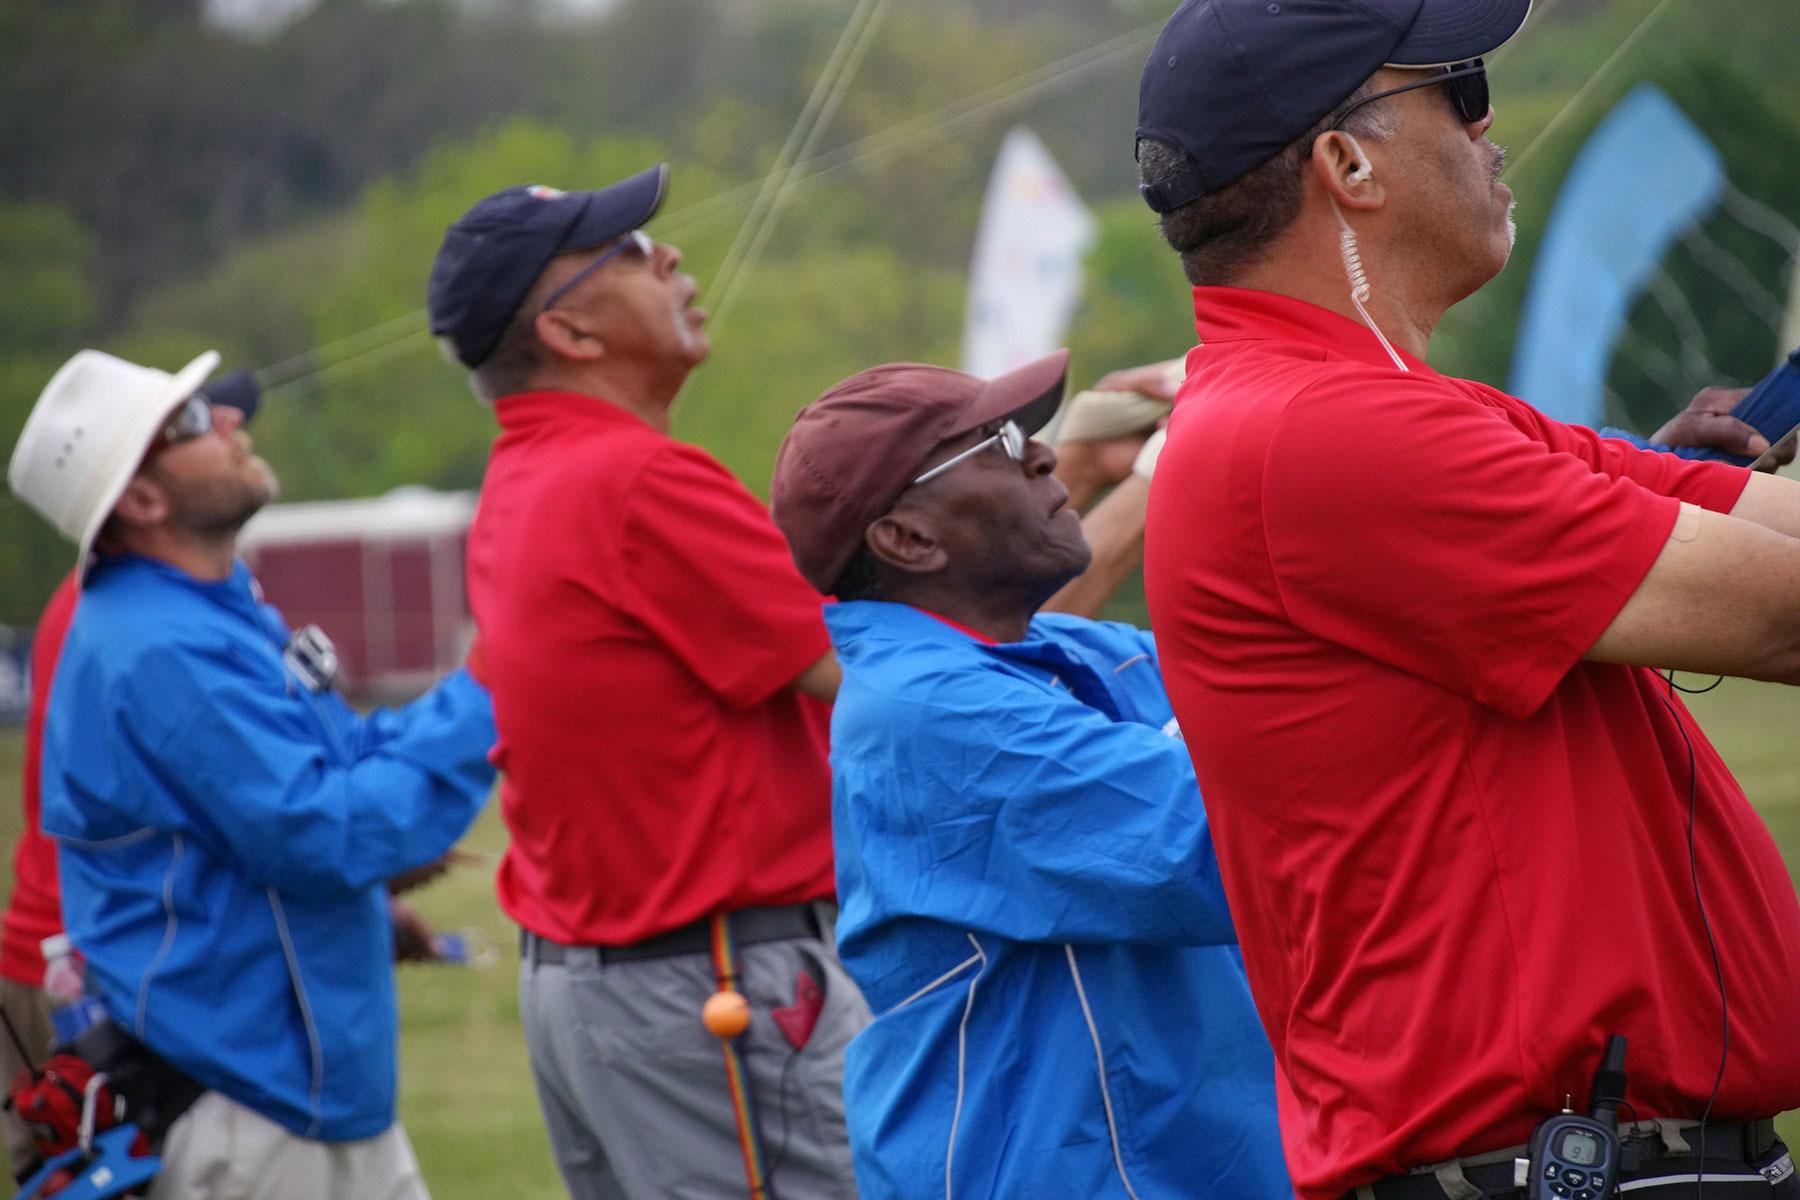 photo essay sky dancing kites the milwaukee independent 052816 kitefest 1697